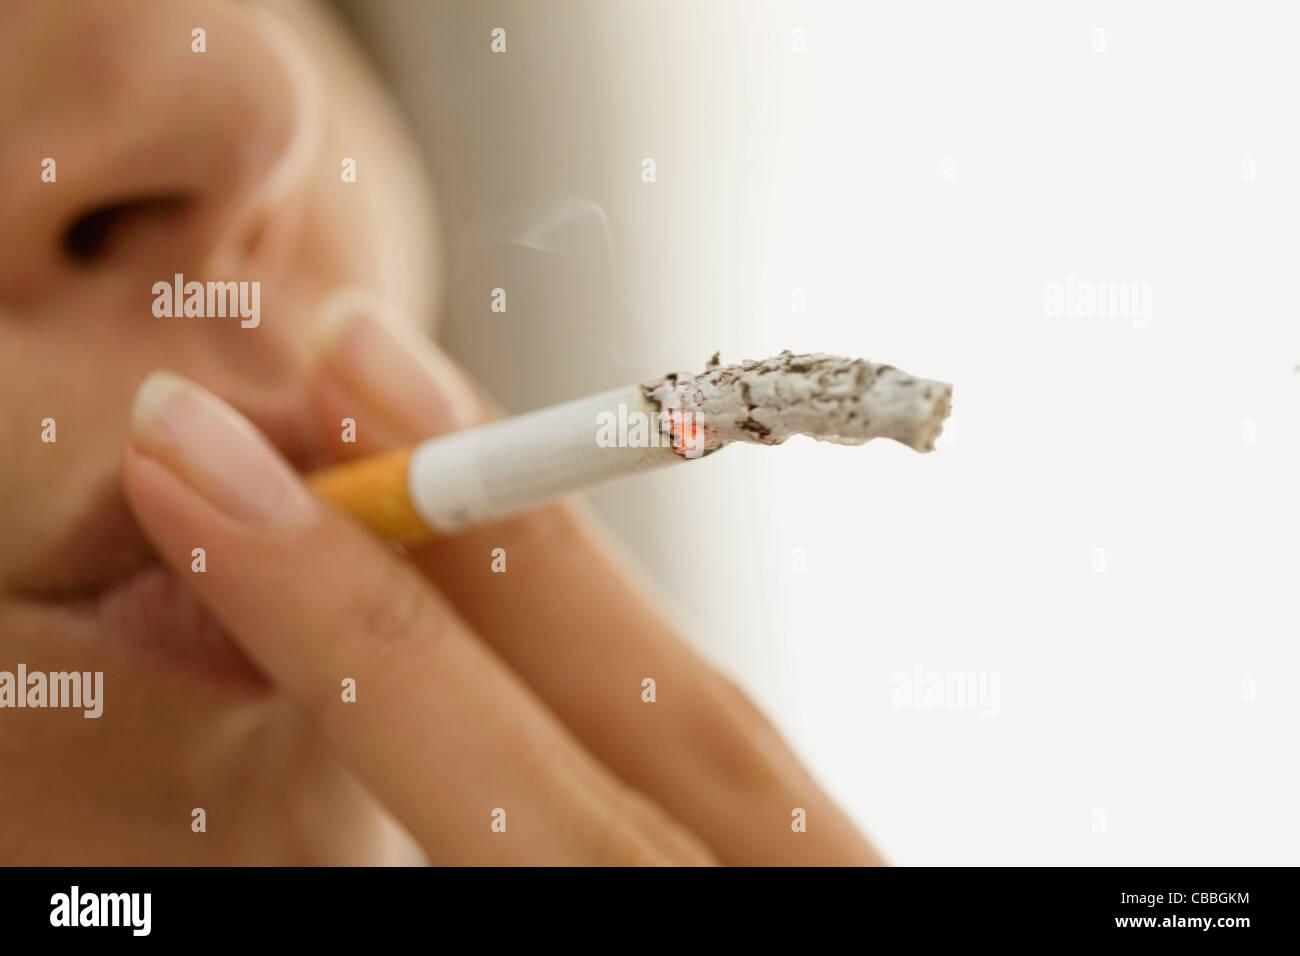 Nahaufnahme von Frau Rauchen Zigarette Stockbild